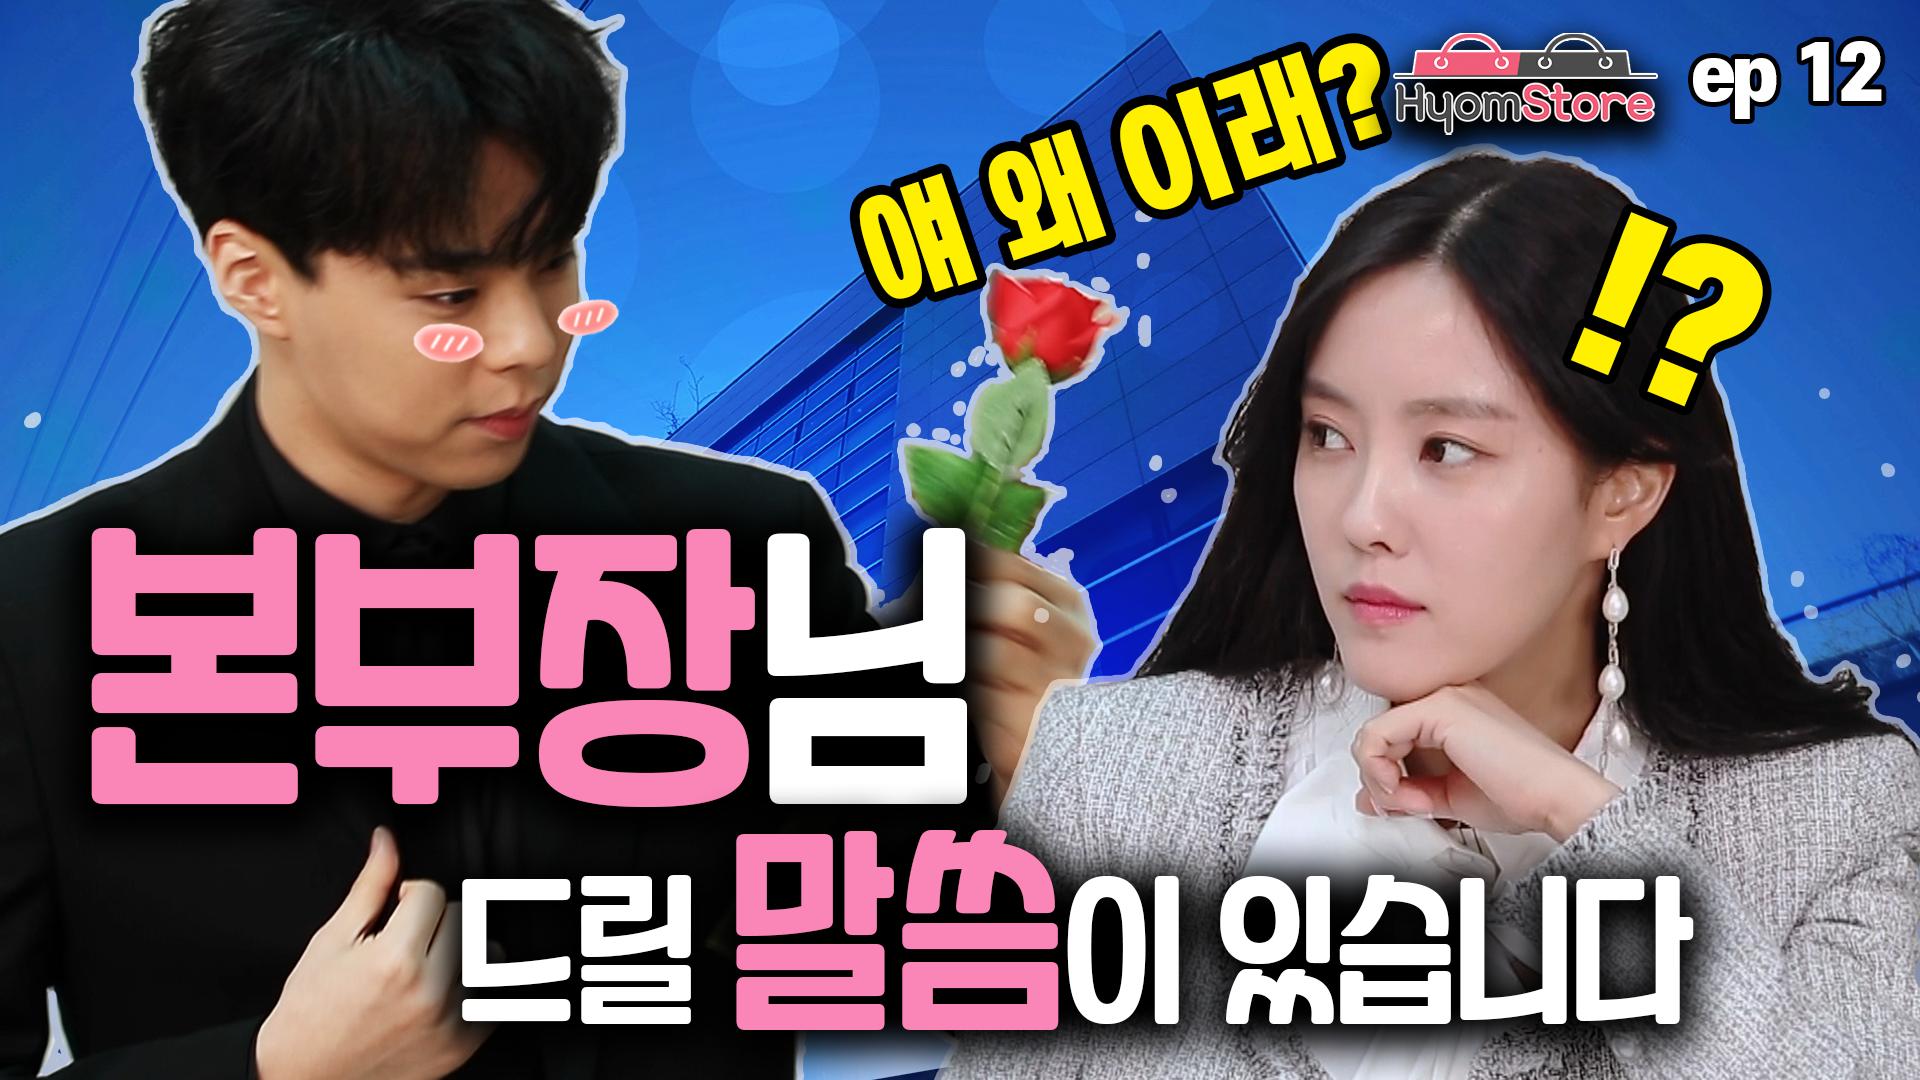 ep.12  방심은 금물! 강비서가 왜 그럴까? (feat. 장미꽃)